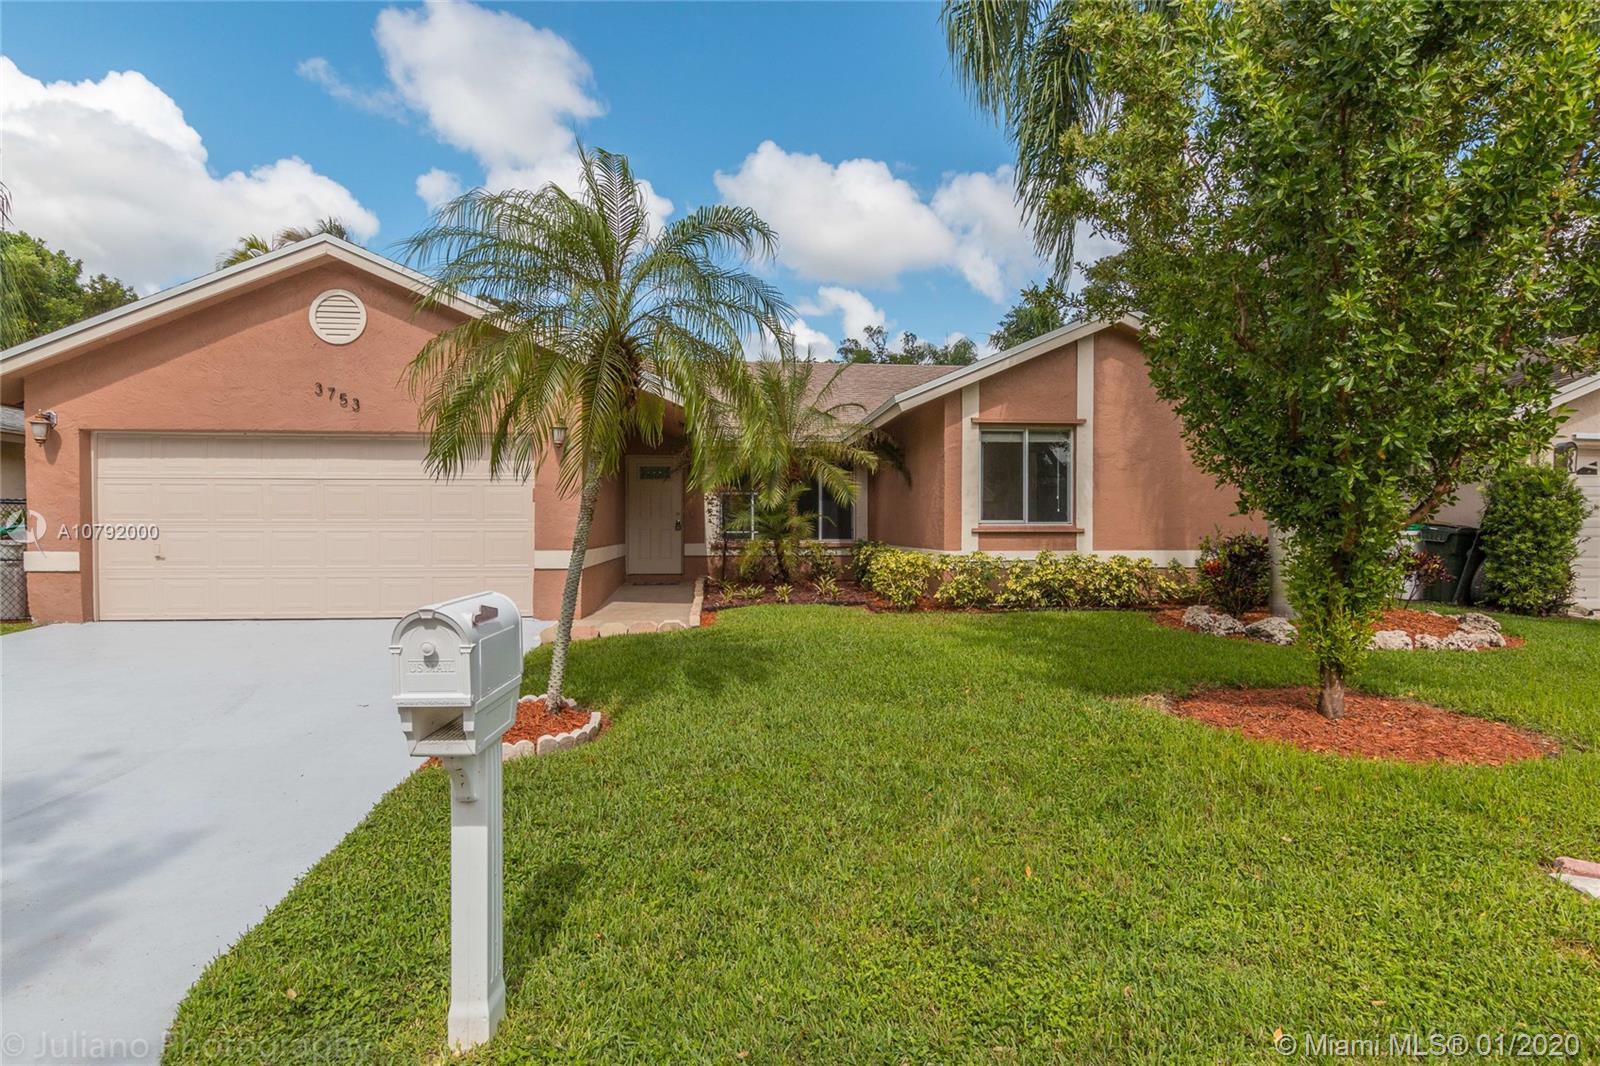 3753 NW 59th St, Coconut Creek, FL 33073